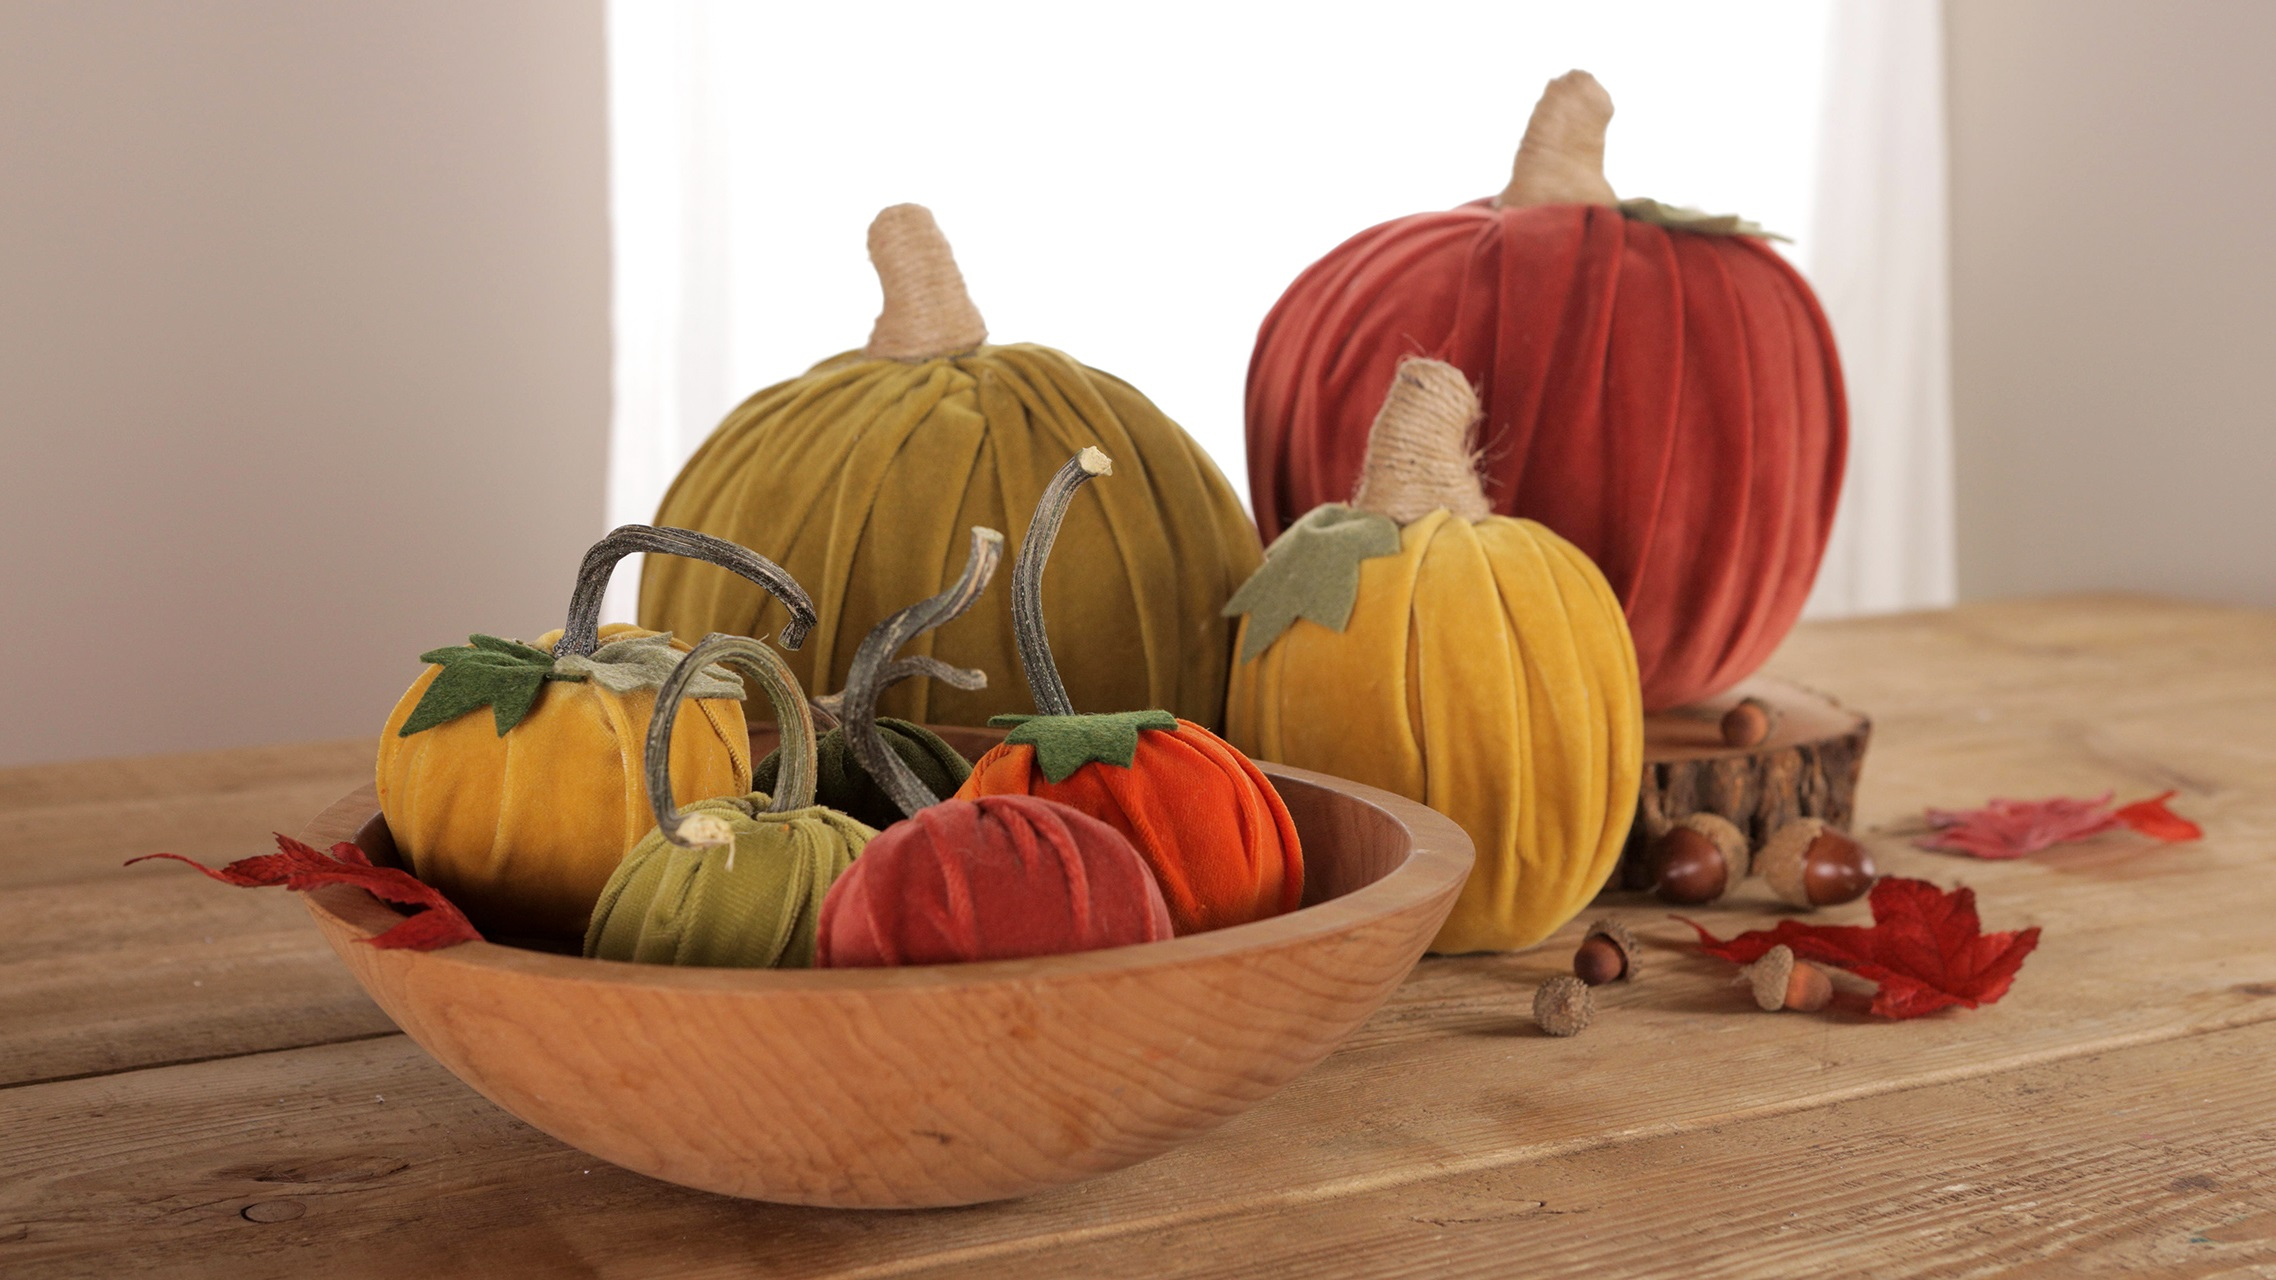 Bricolage d'automne: citrouilles en tissu.